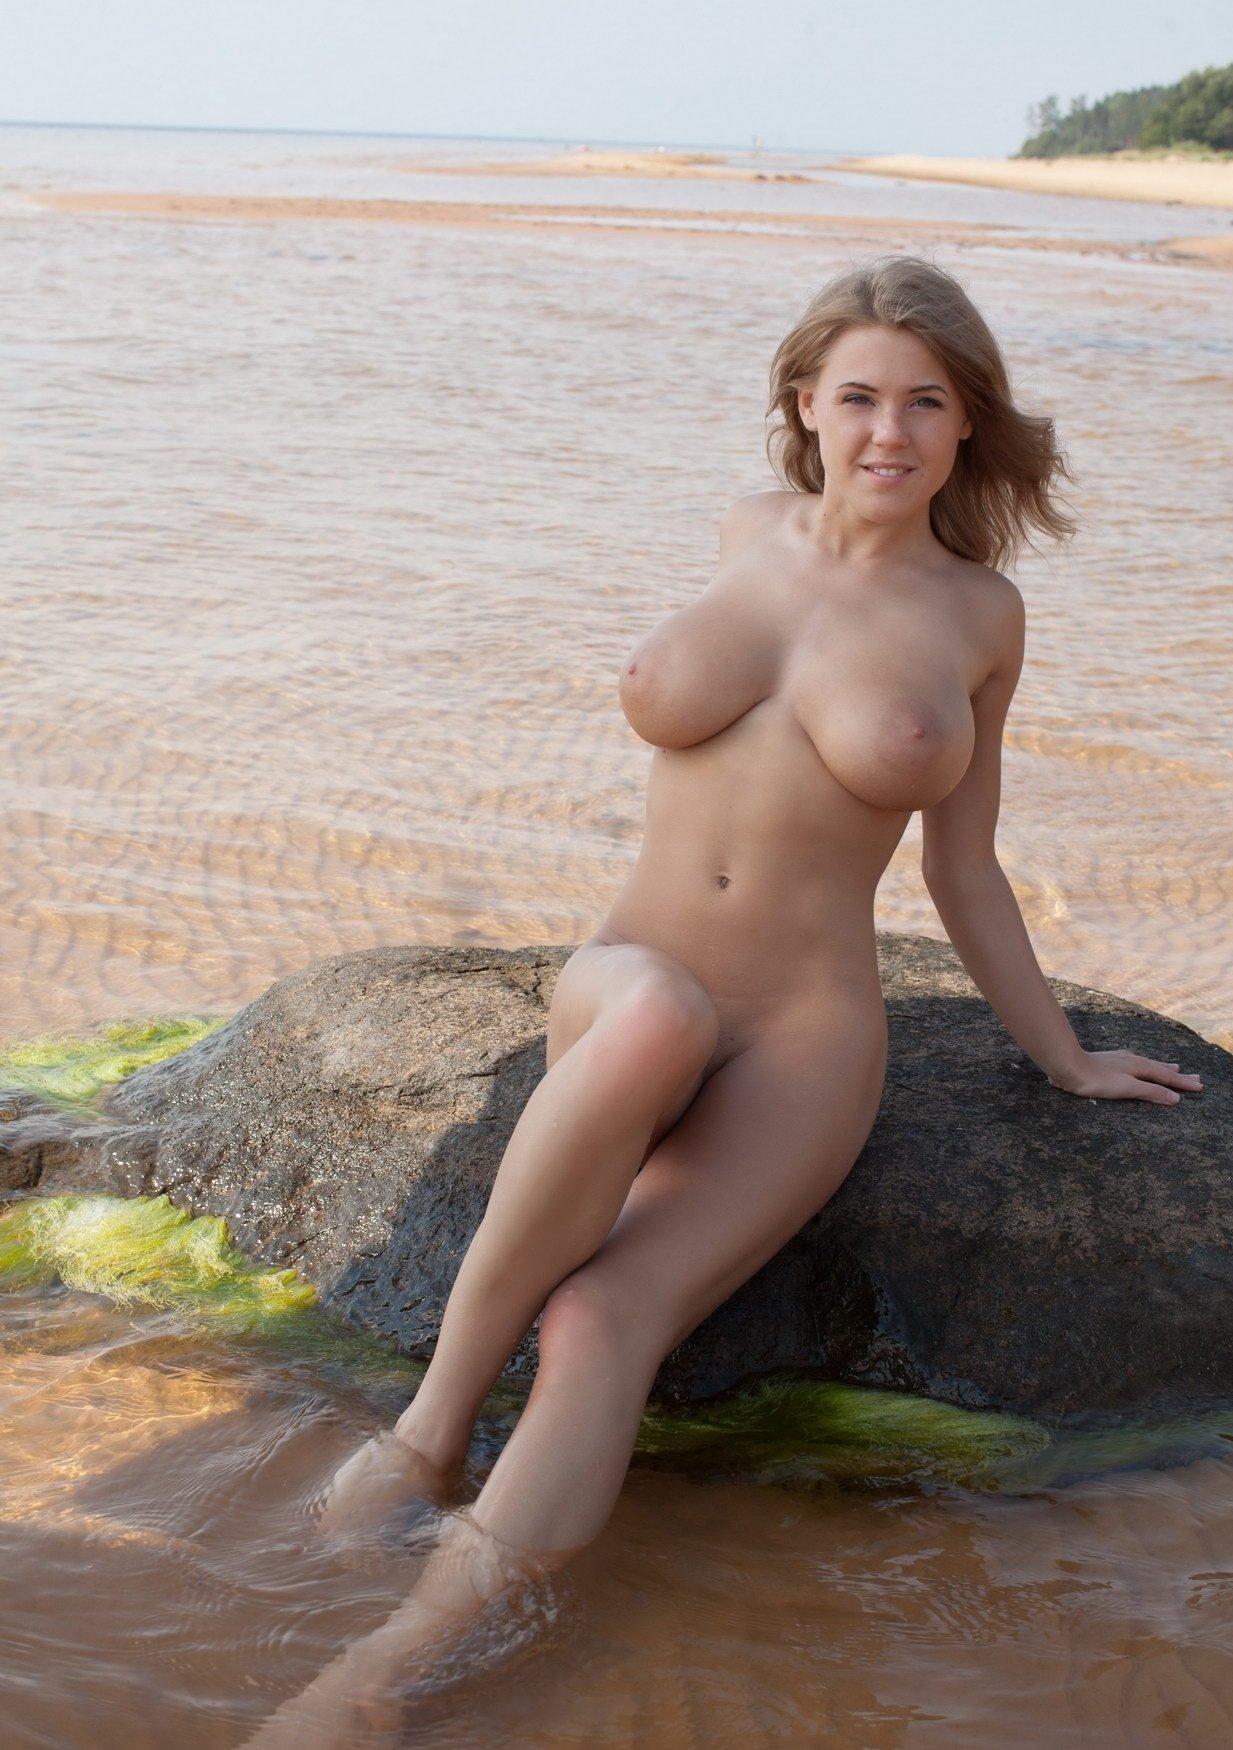 Ххх бисексуалы фото пышногрудых обнаженных девиц трахают